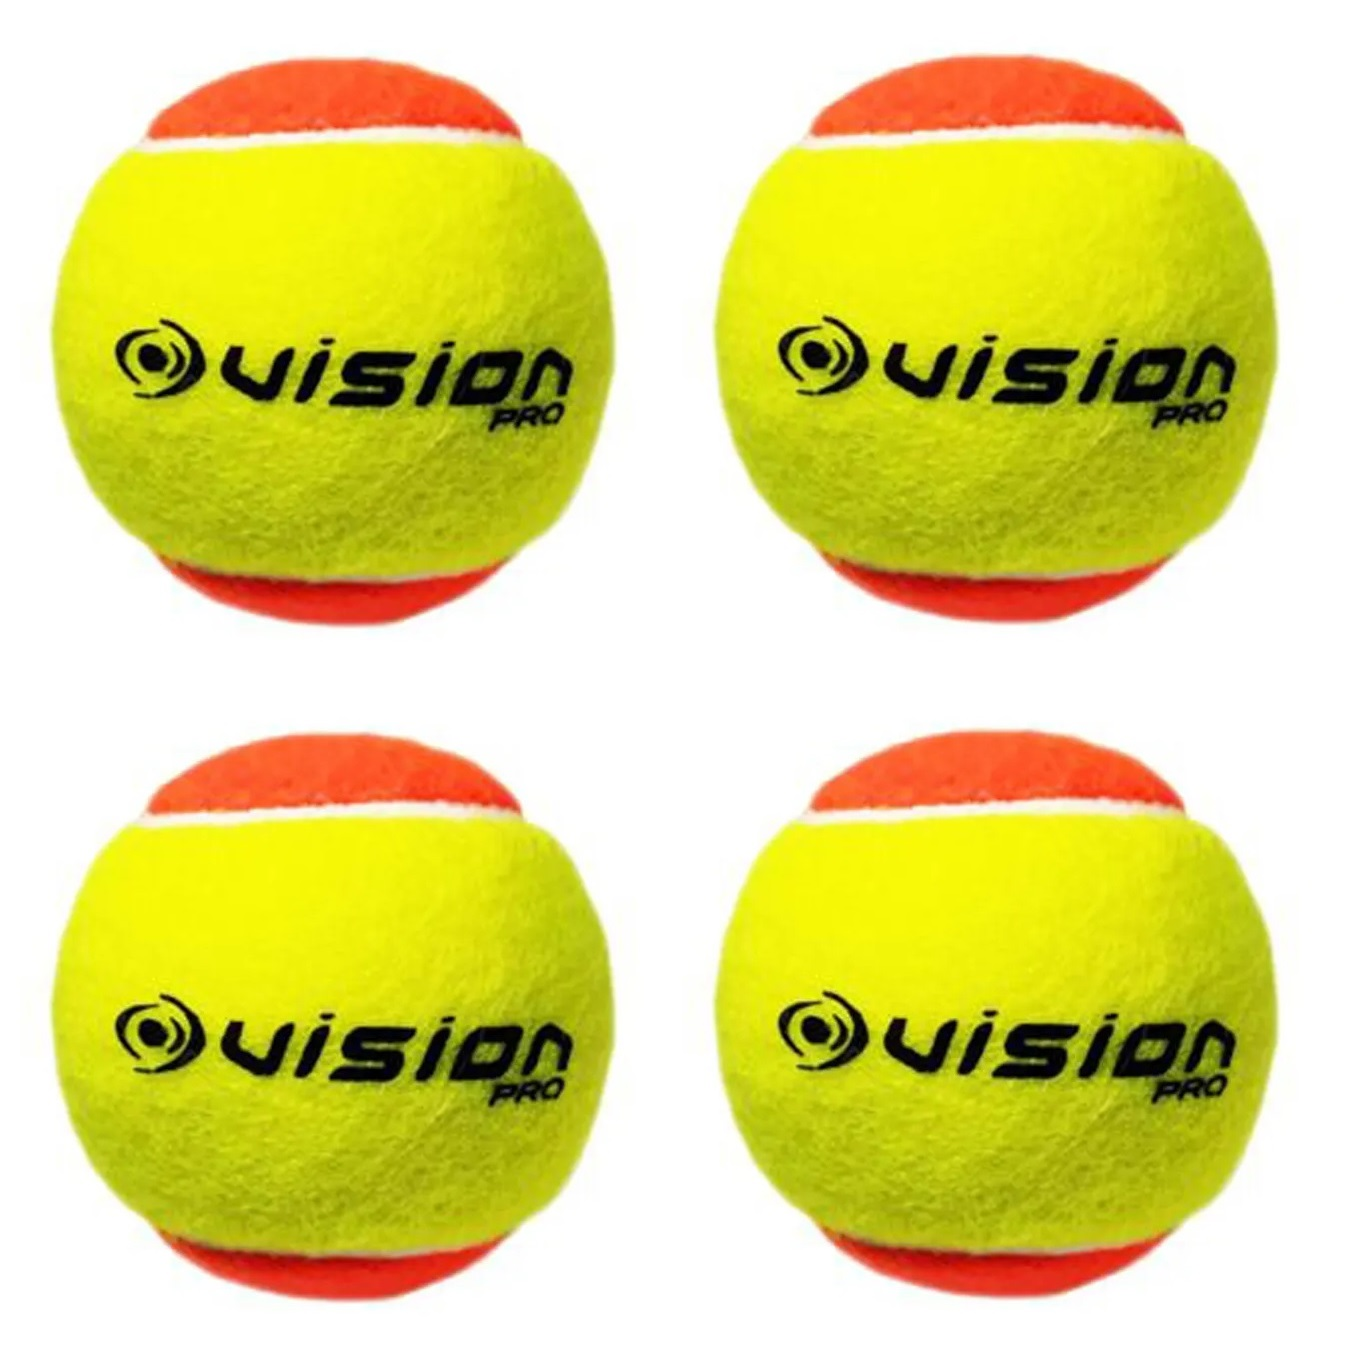 Bola Beach Tennis Vision Pro Kit c/ 4 Bolas